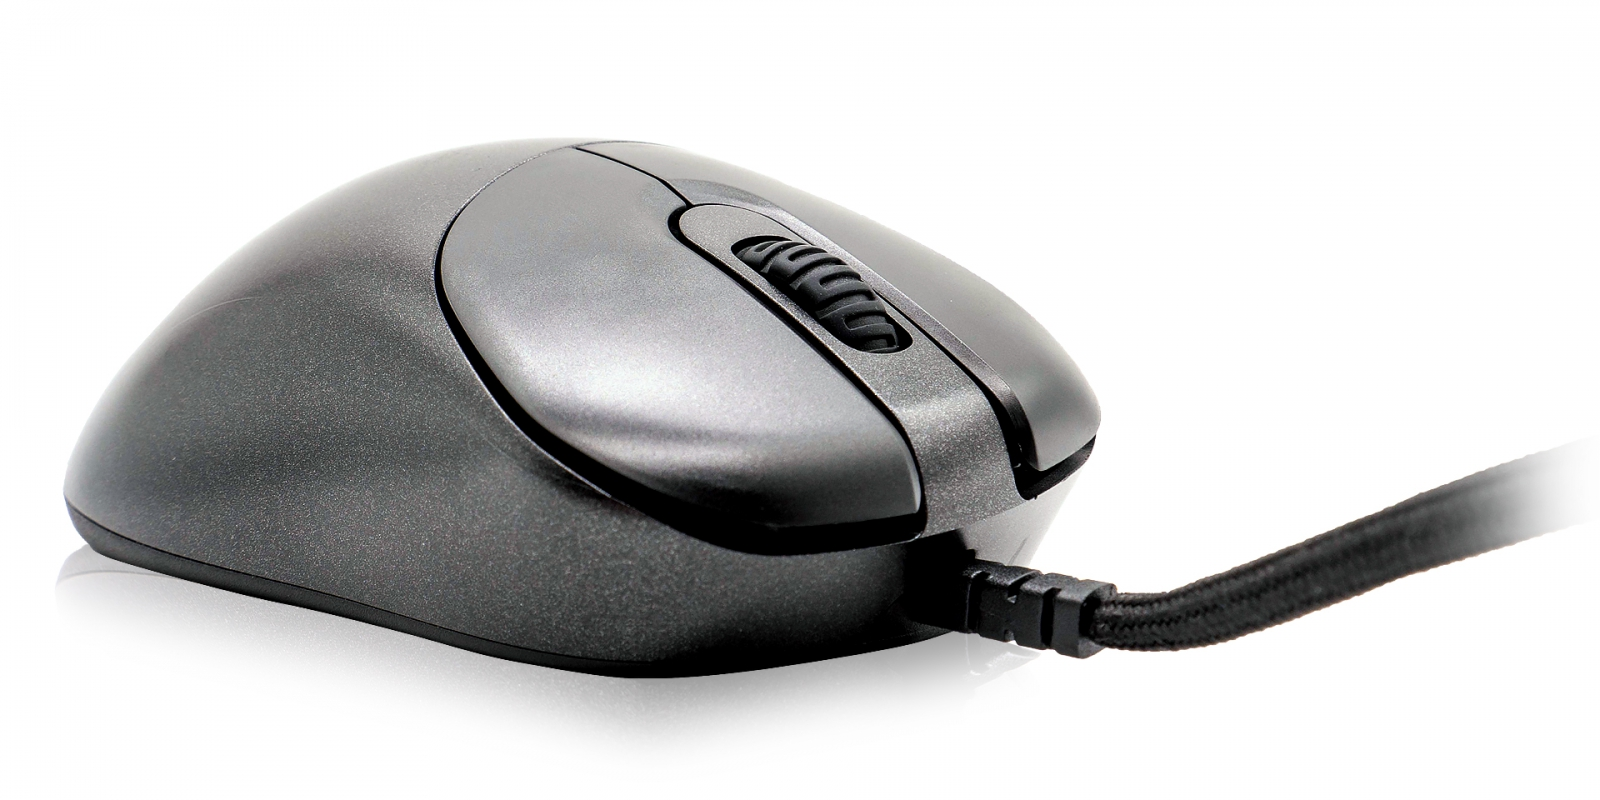 vaxee、alexとのコラボレーションで誕生した左右非対称ゲーミングマウス「OUTSET AX」を発表